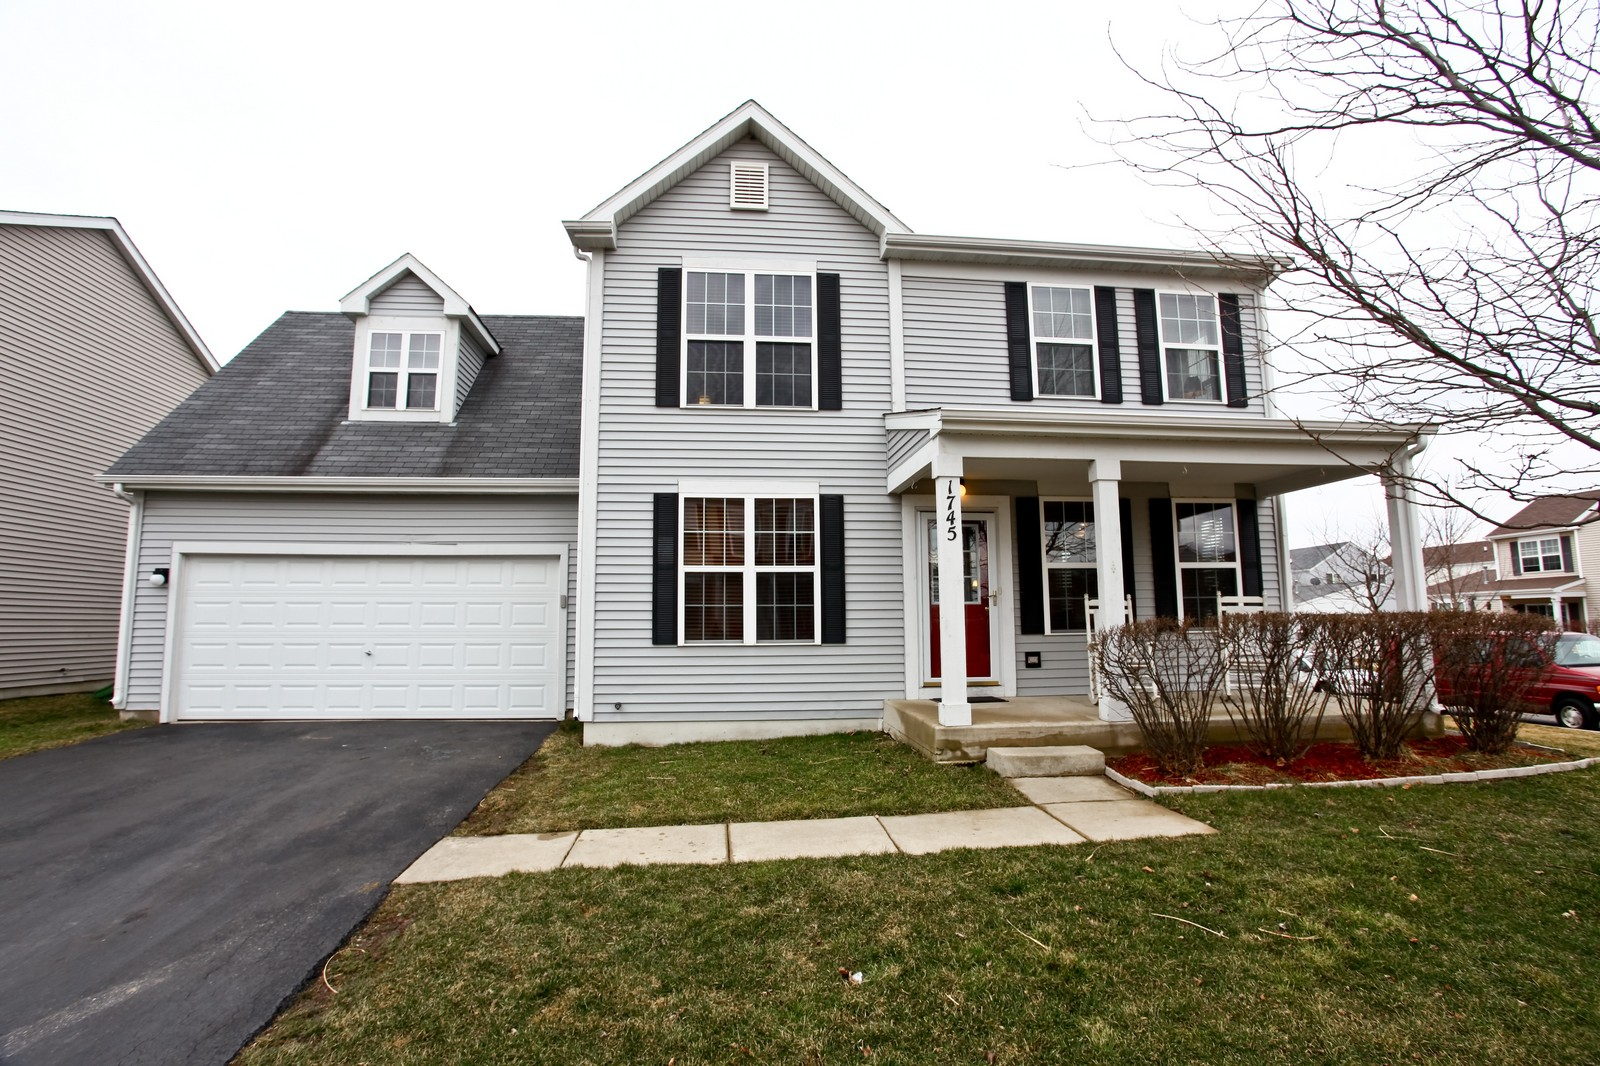 Real Estate Photography - 1745 Rebecca Lane, Aurora, IL, 60504 - Front View